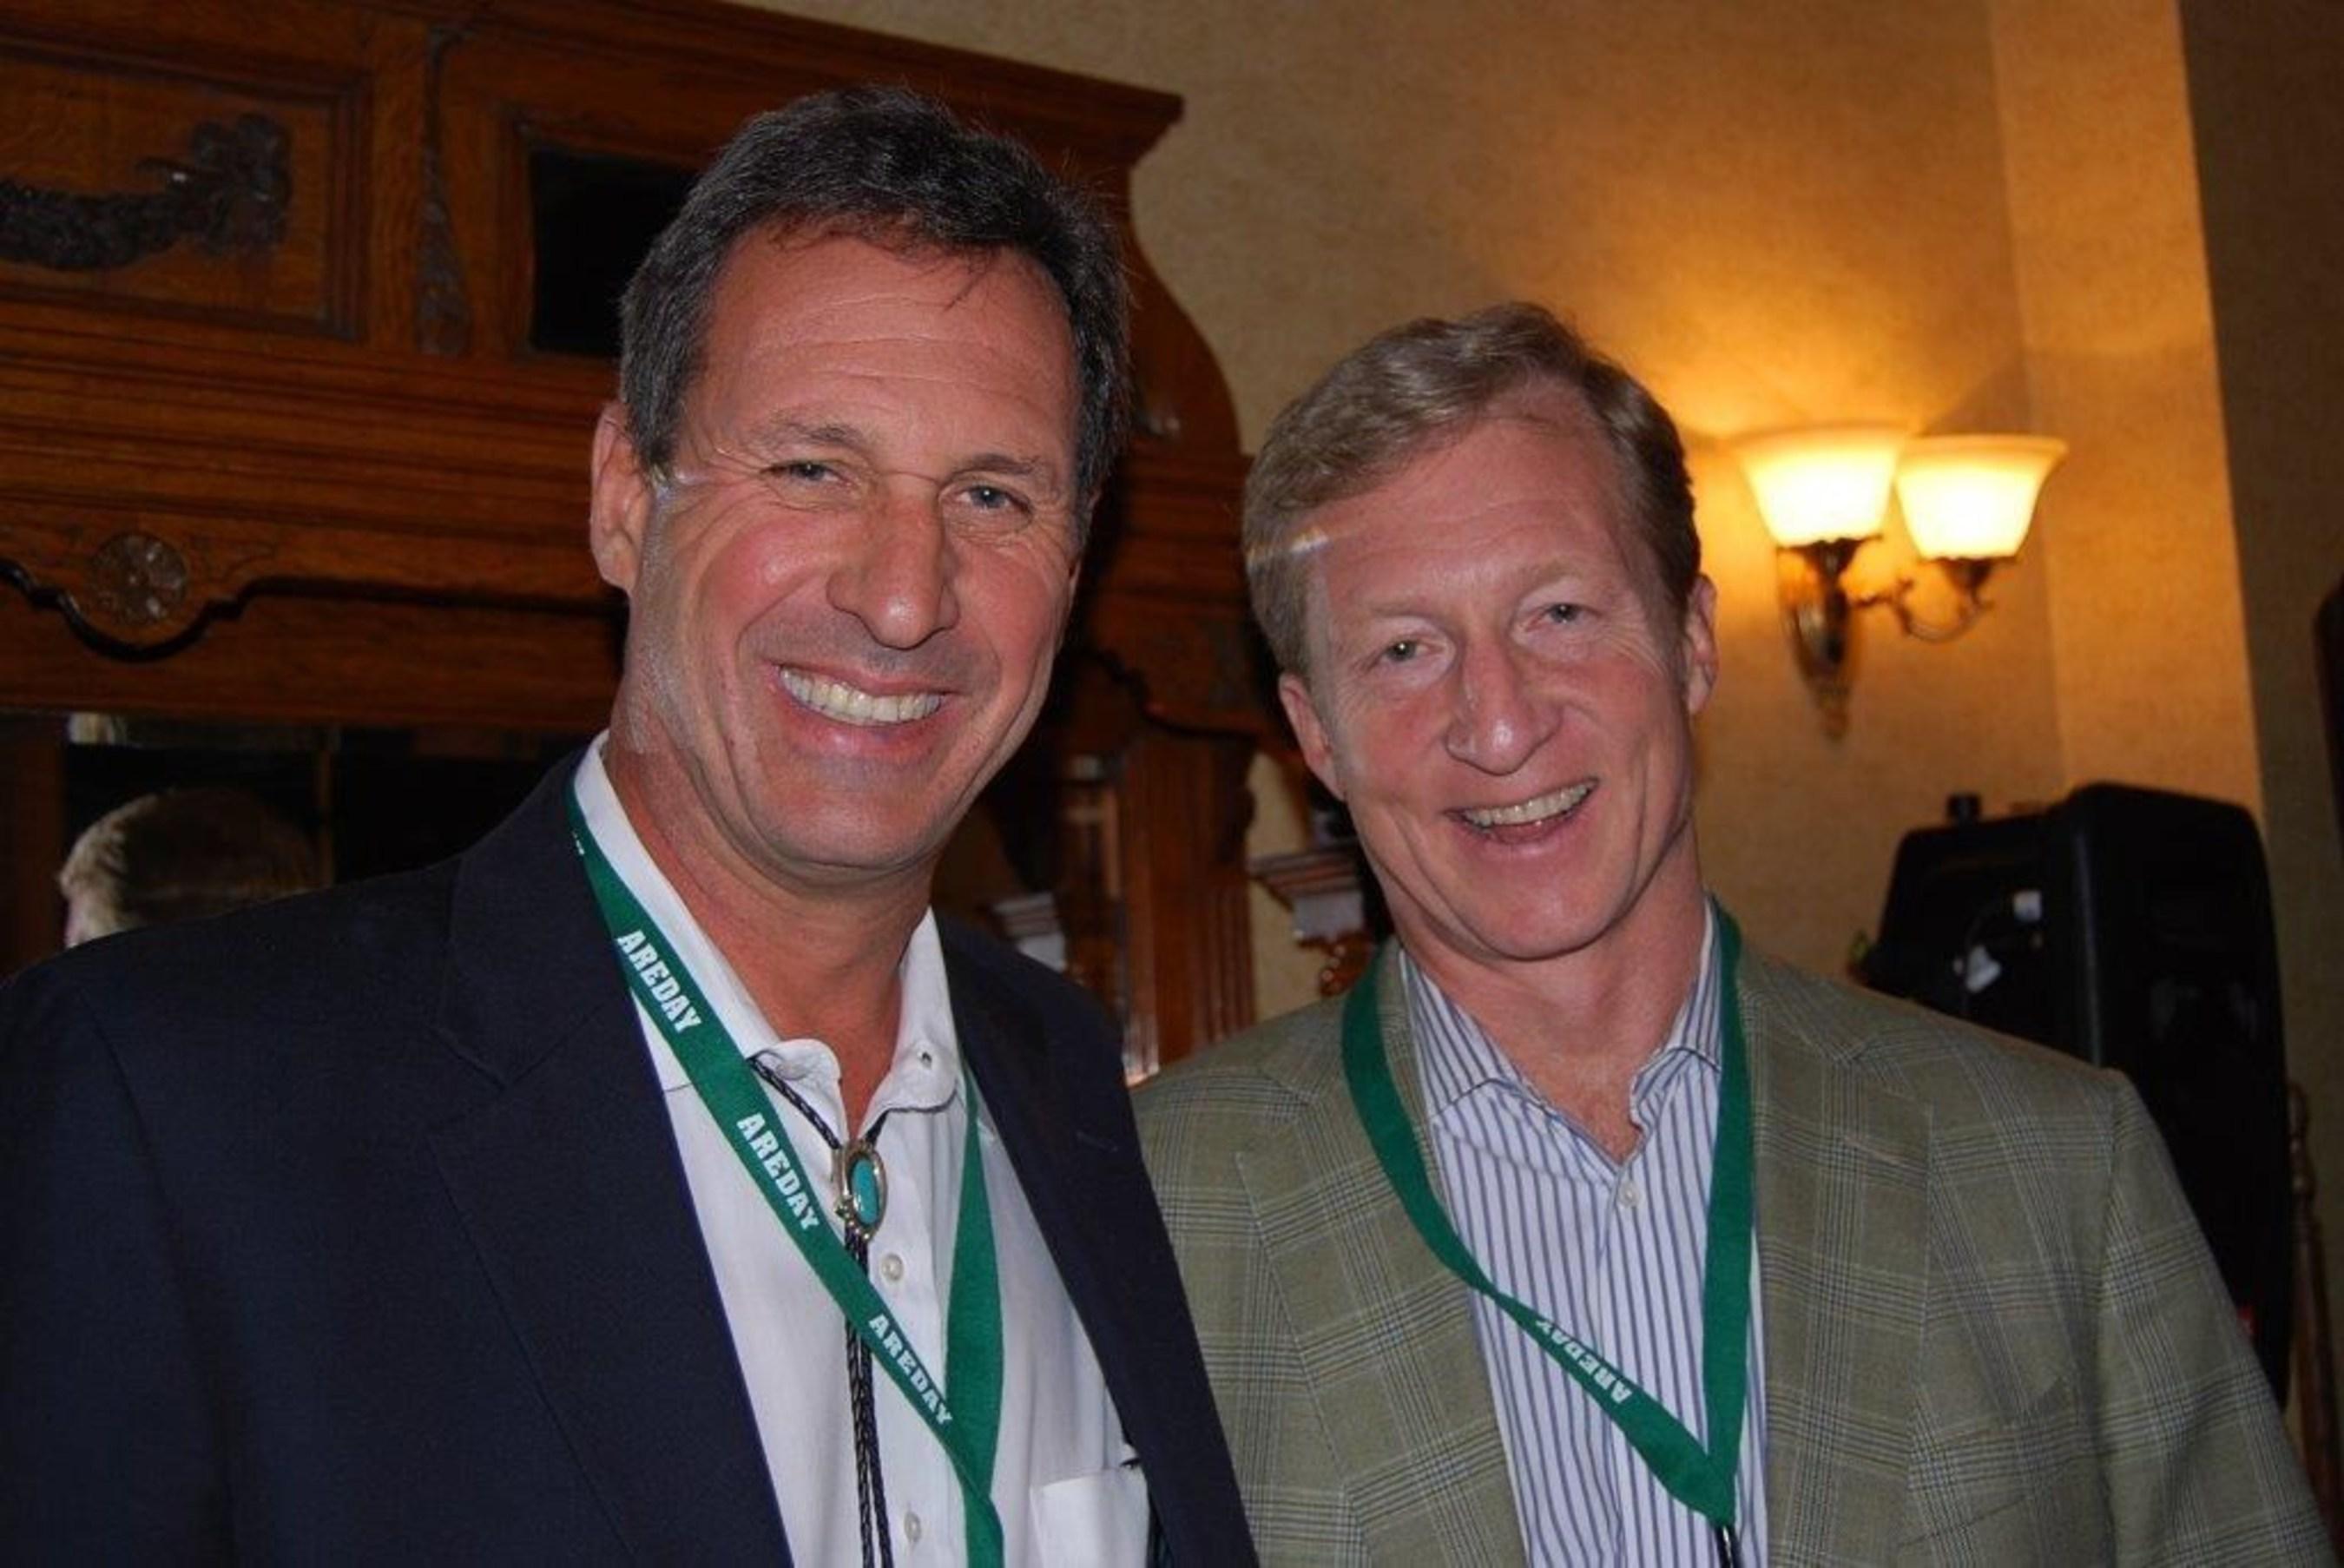 AREDAY CEO Chip Comins & philanthropist Tom Steyer at AREDAY in 2011 (PRNewsFoto/AREDAY)